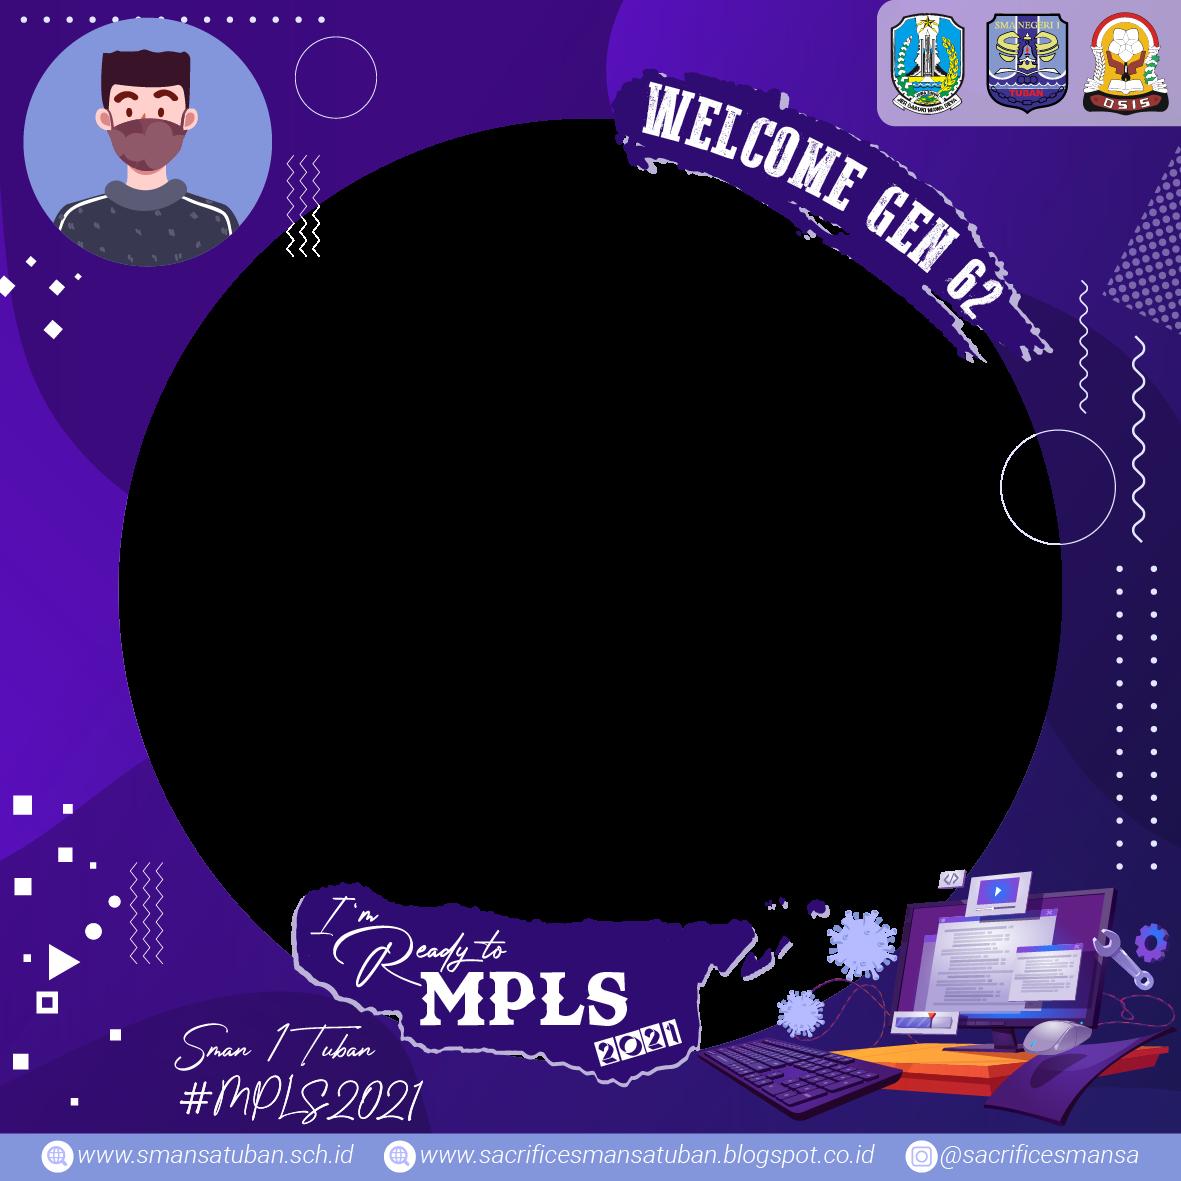 MPLS 2021